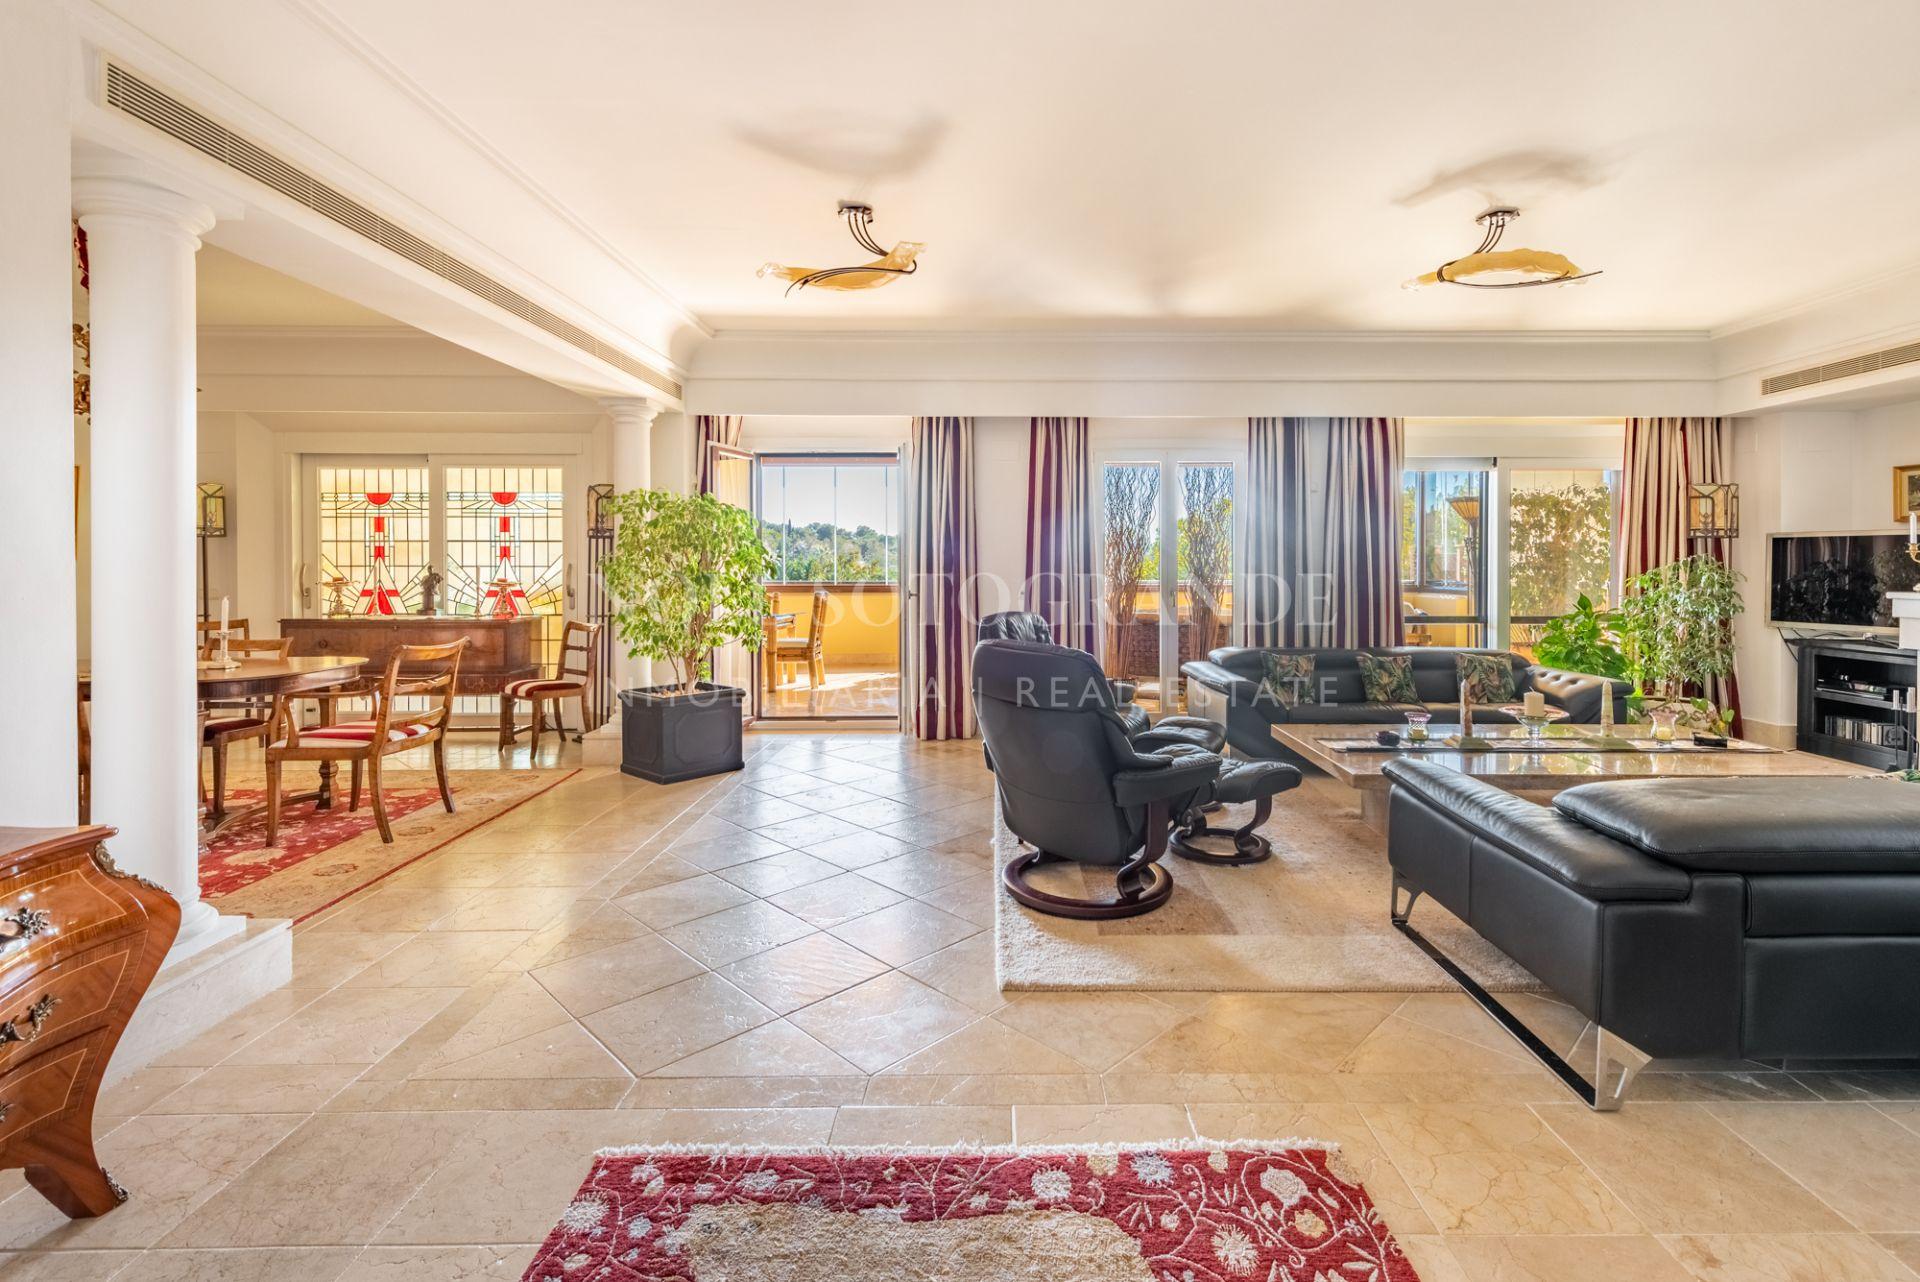 Penthouse for sale in Sotogrande Alto, Valgrande opposite Valderrama